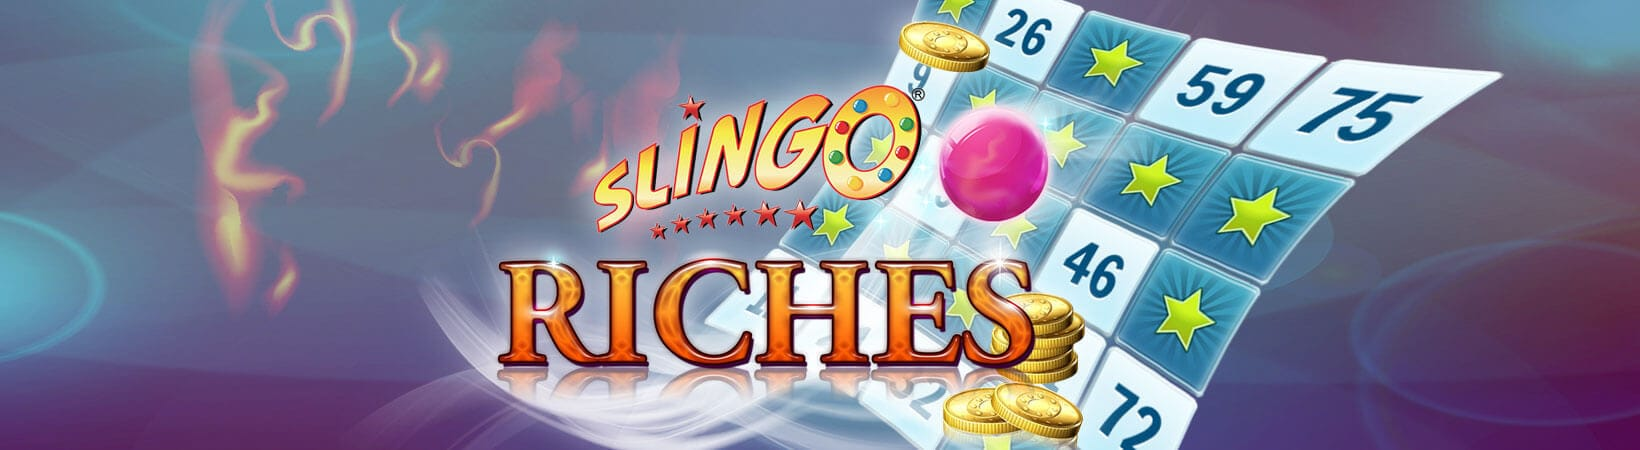 Slingo Riches Review